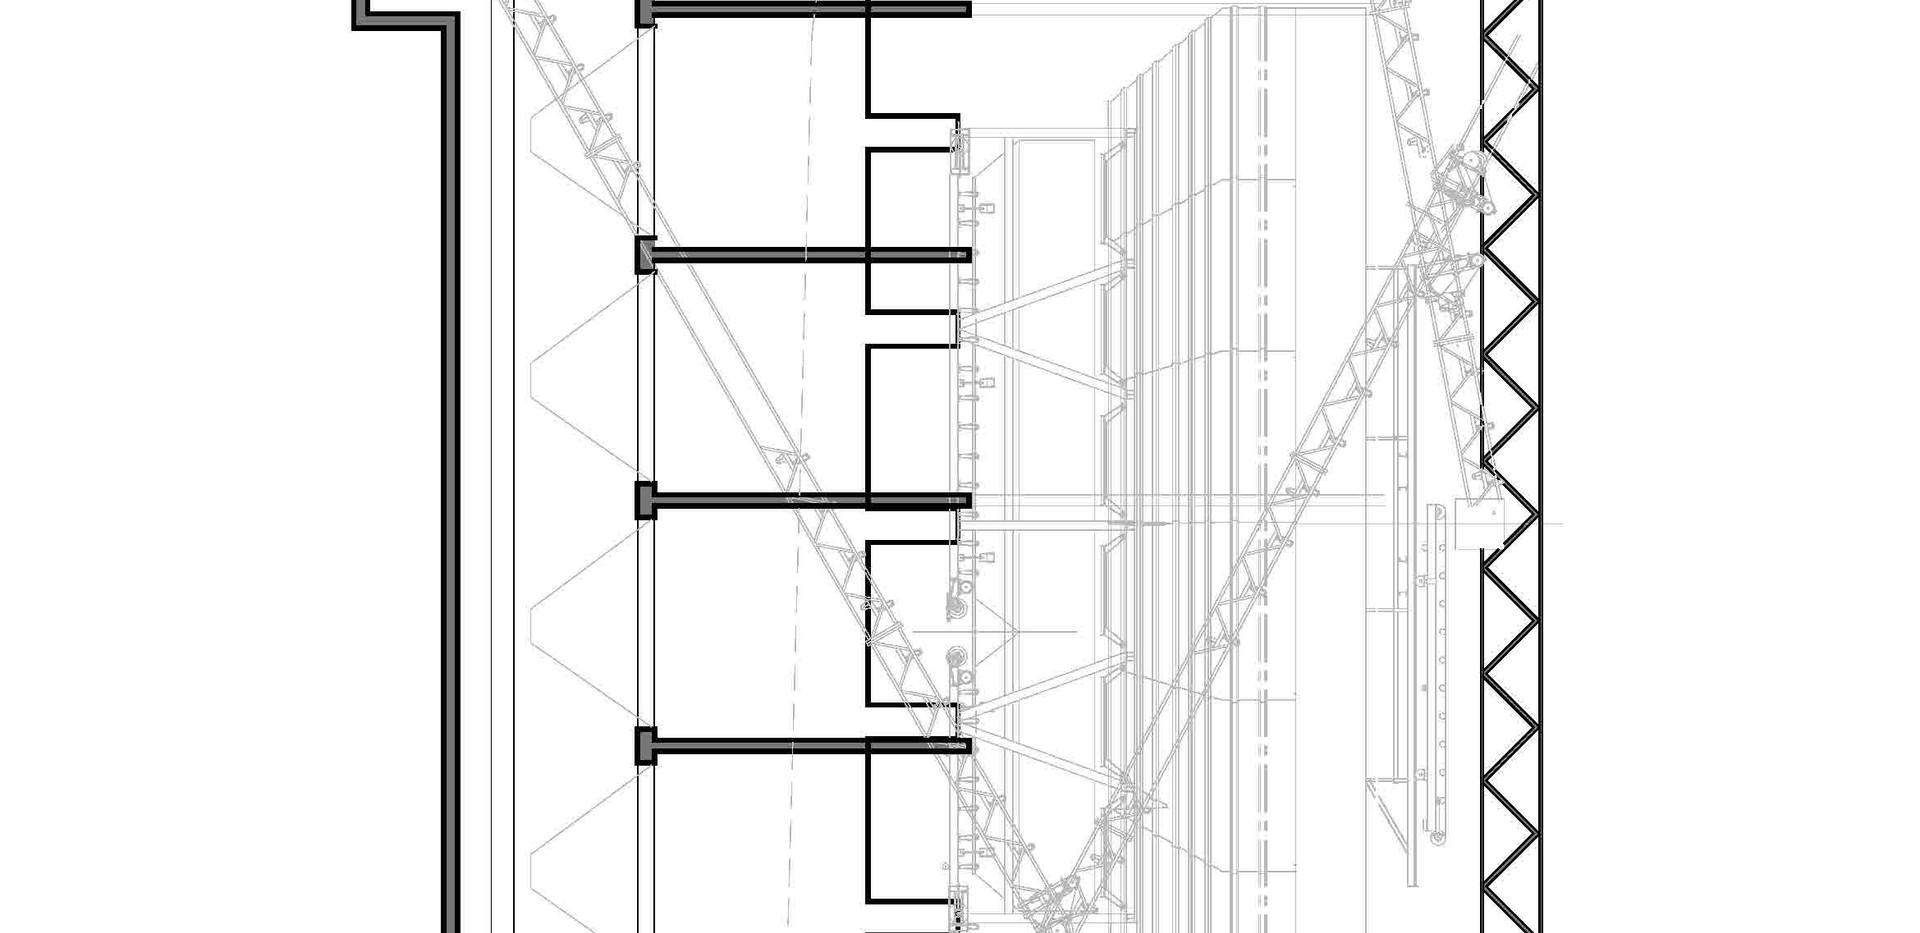 612 SC__B-12m Layout2 (1).jpg